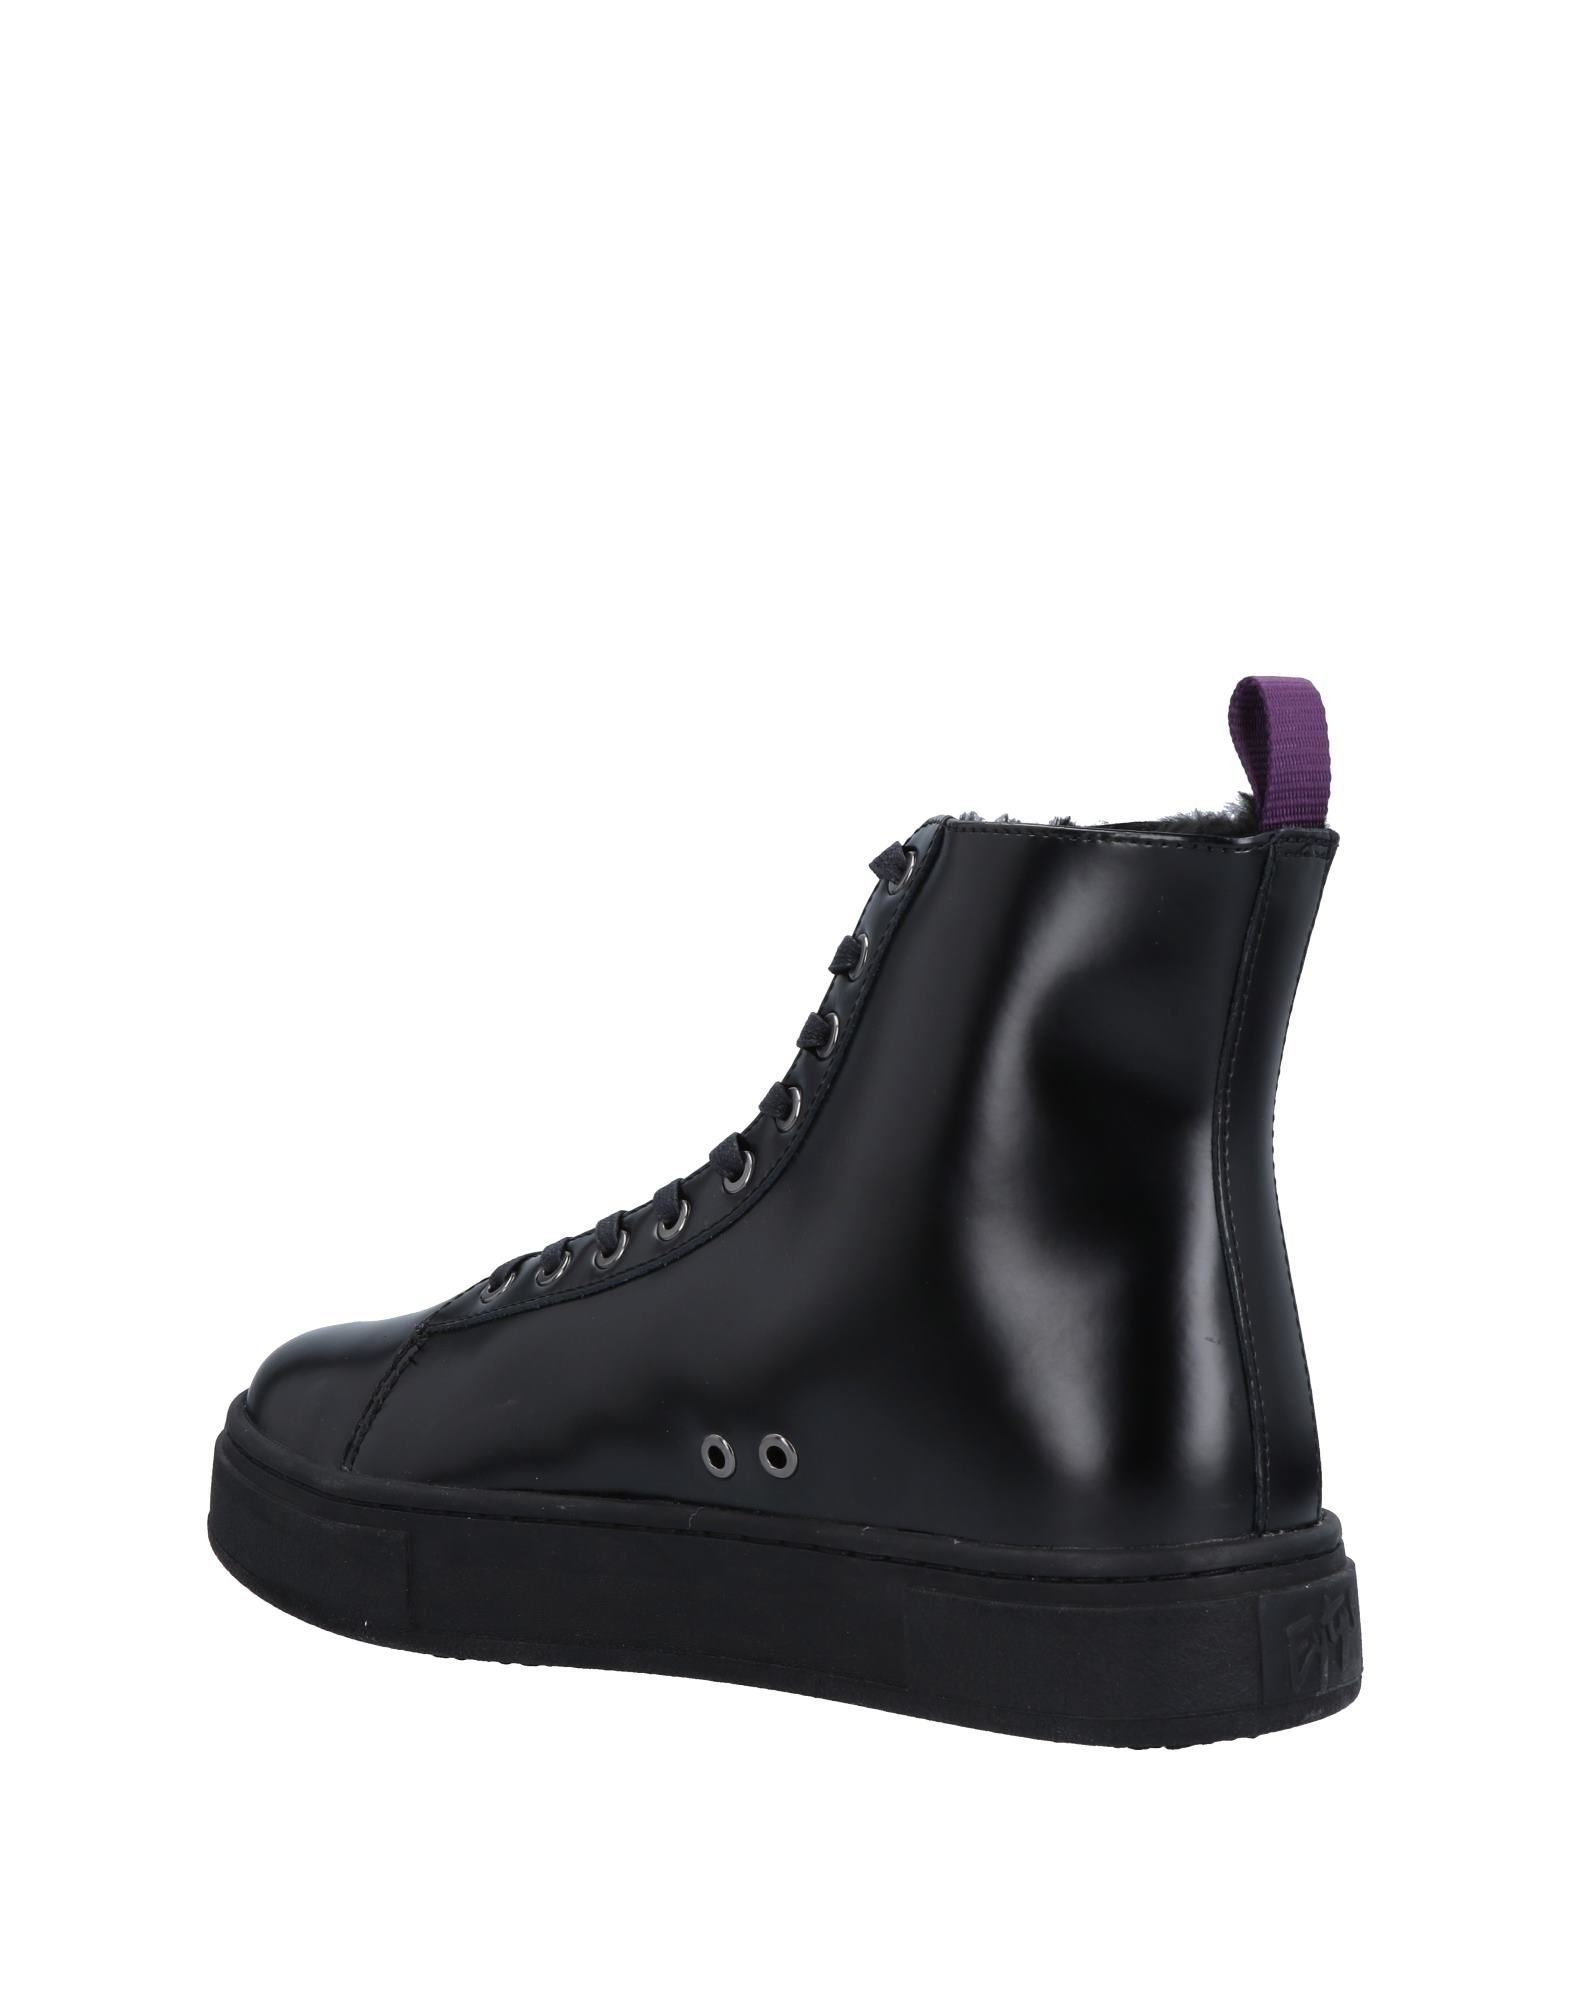 11493472ID Eytys Sneakers Herren  11493472ID  3d06dd